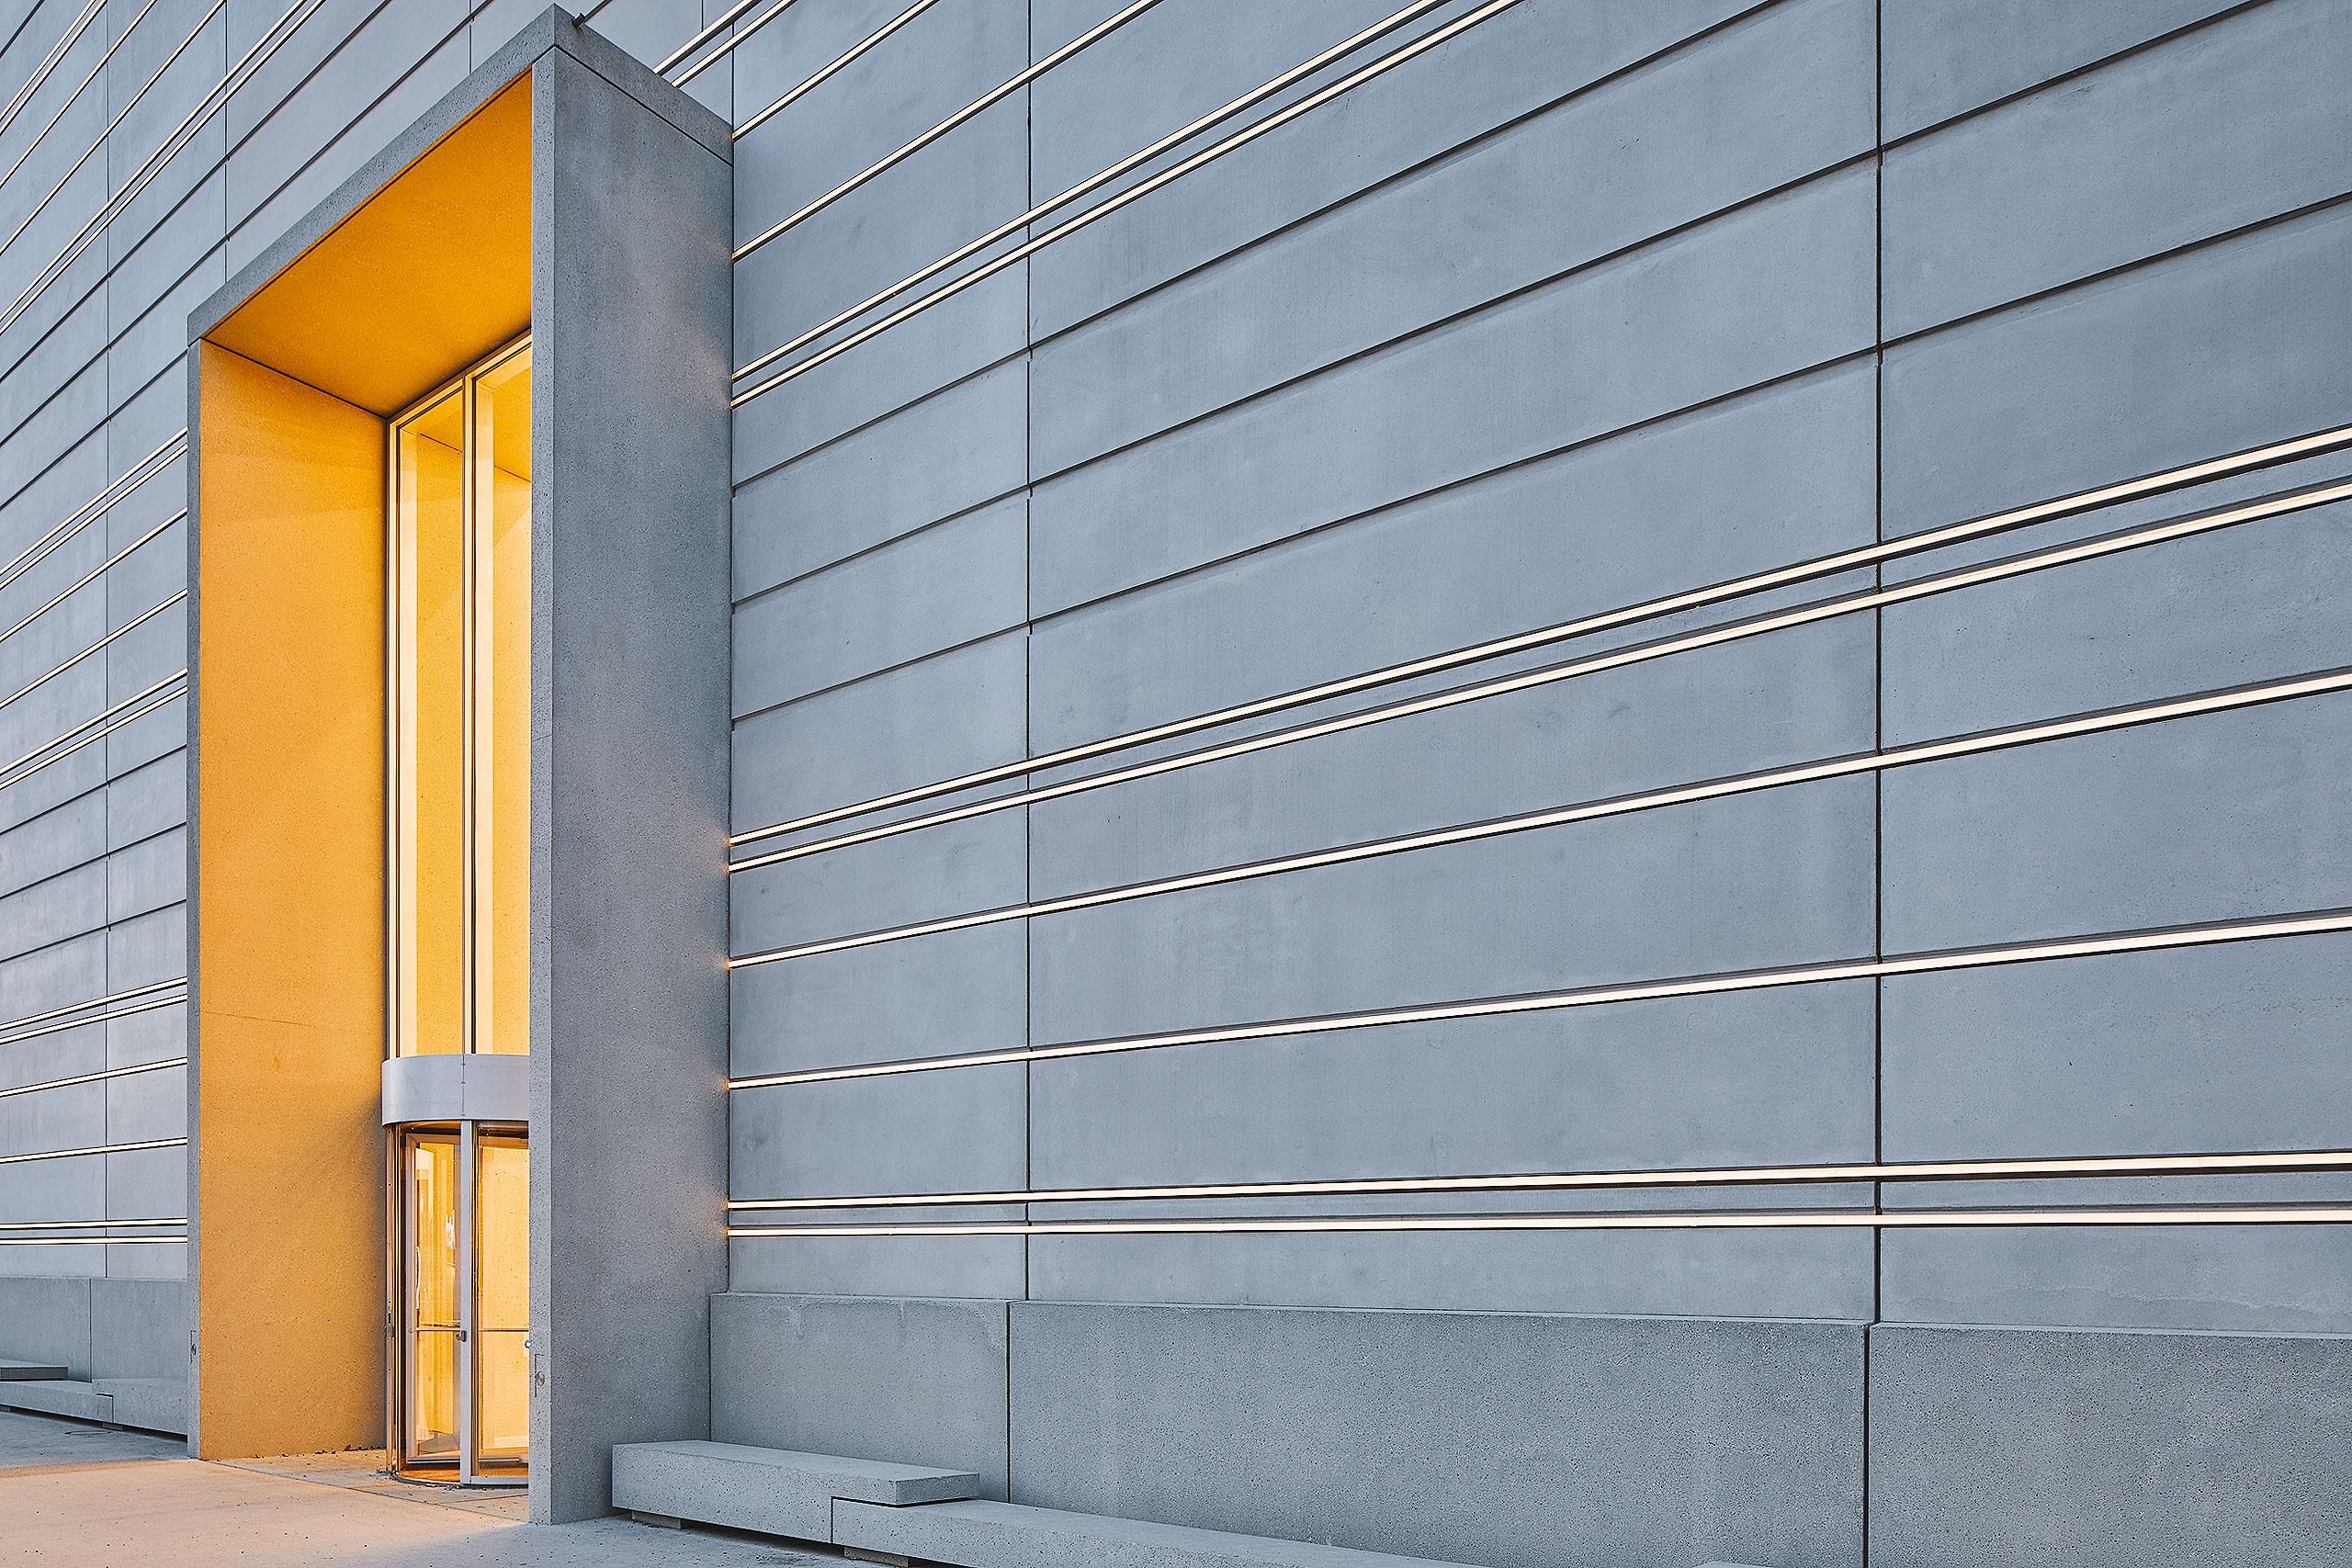 Bauhaus Museum Weimar